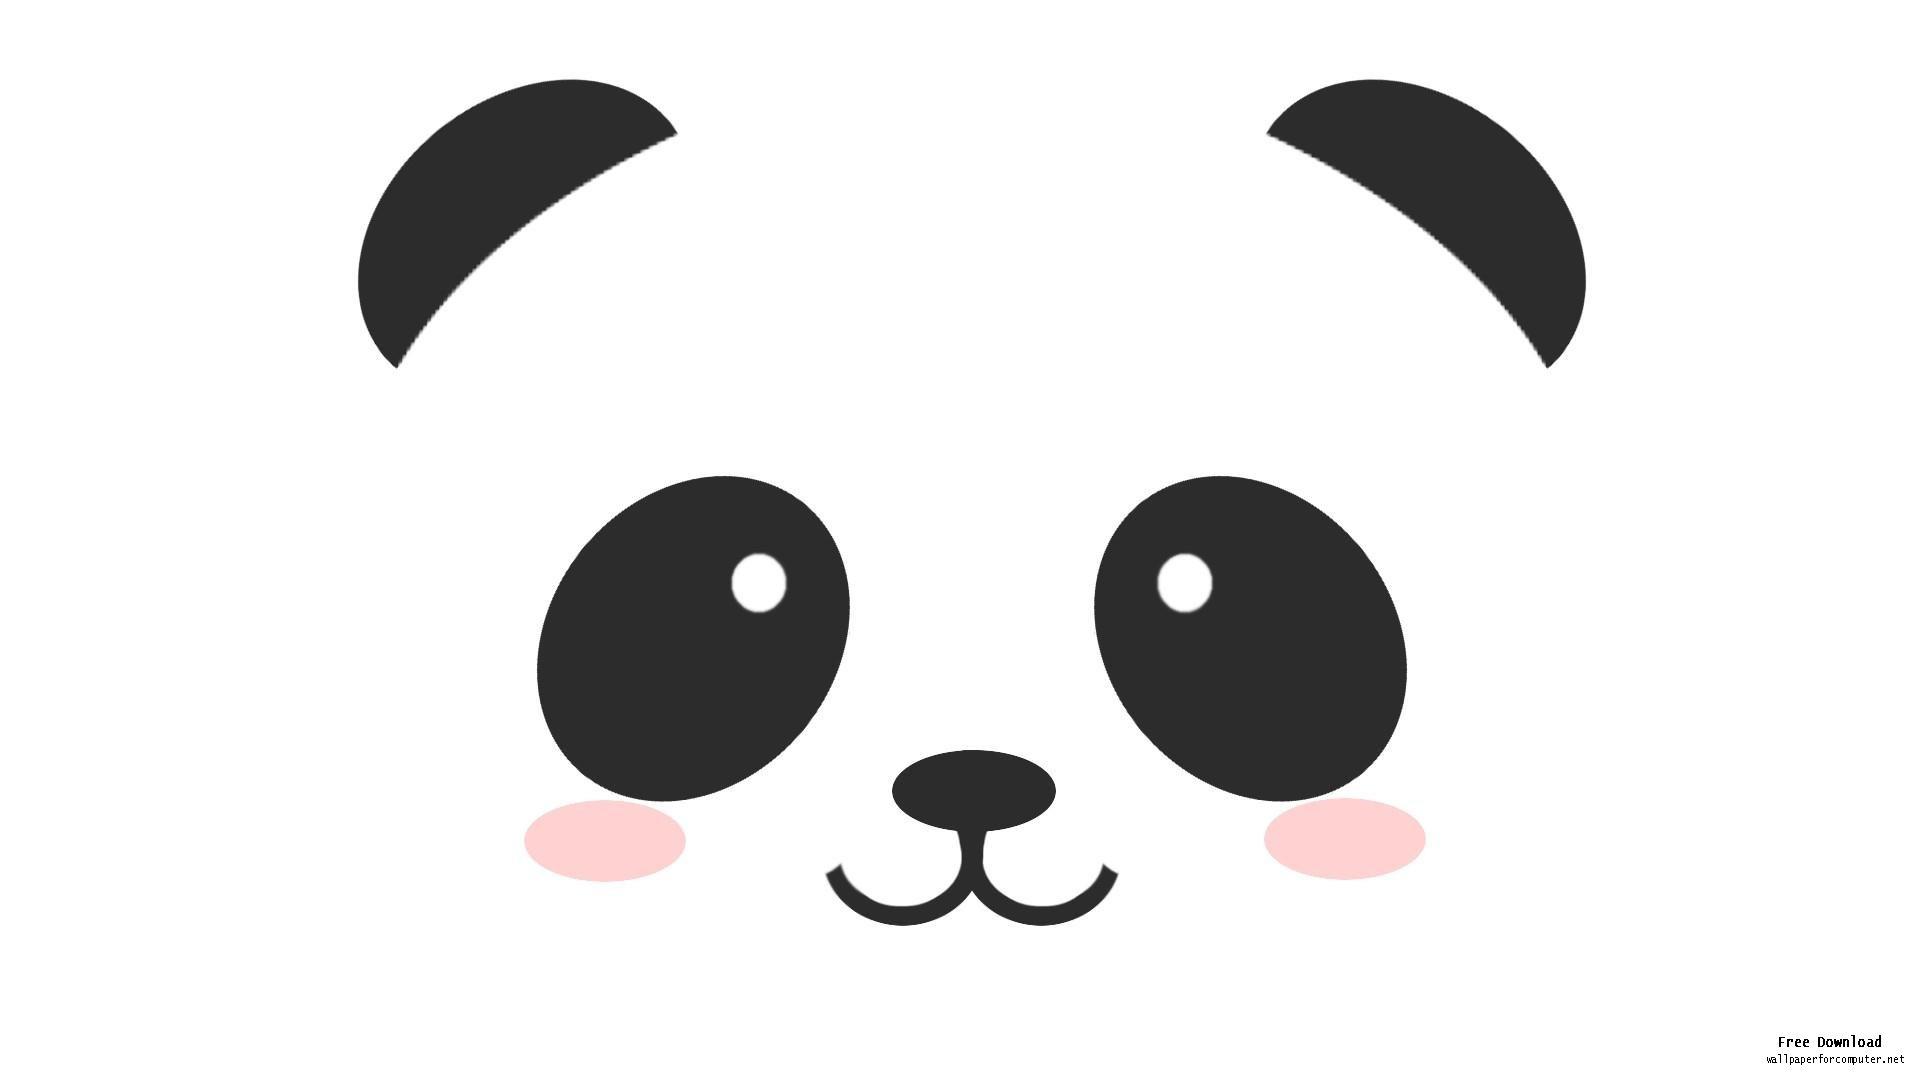 Panda head clipart free images 3.